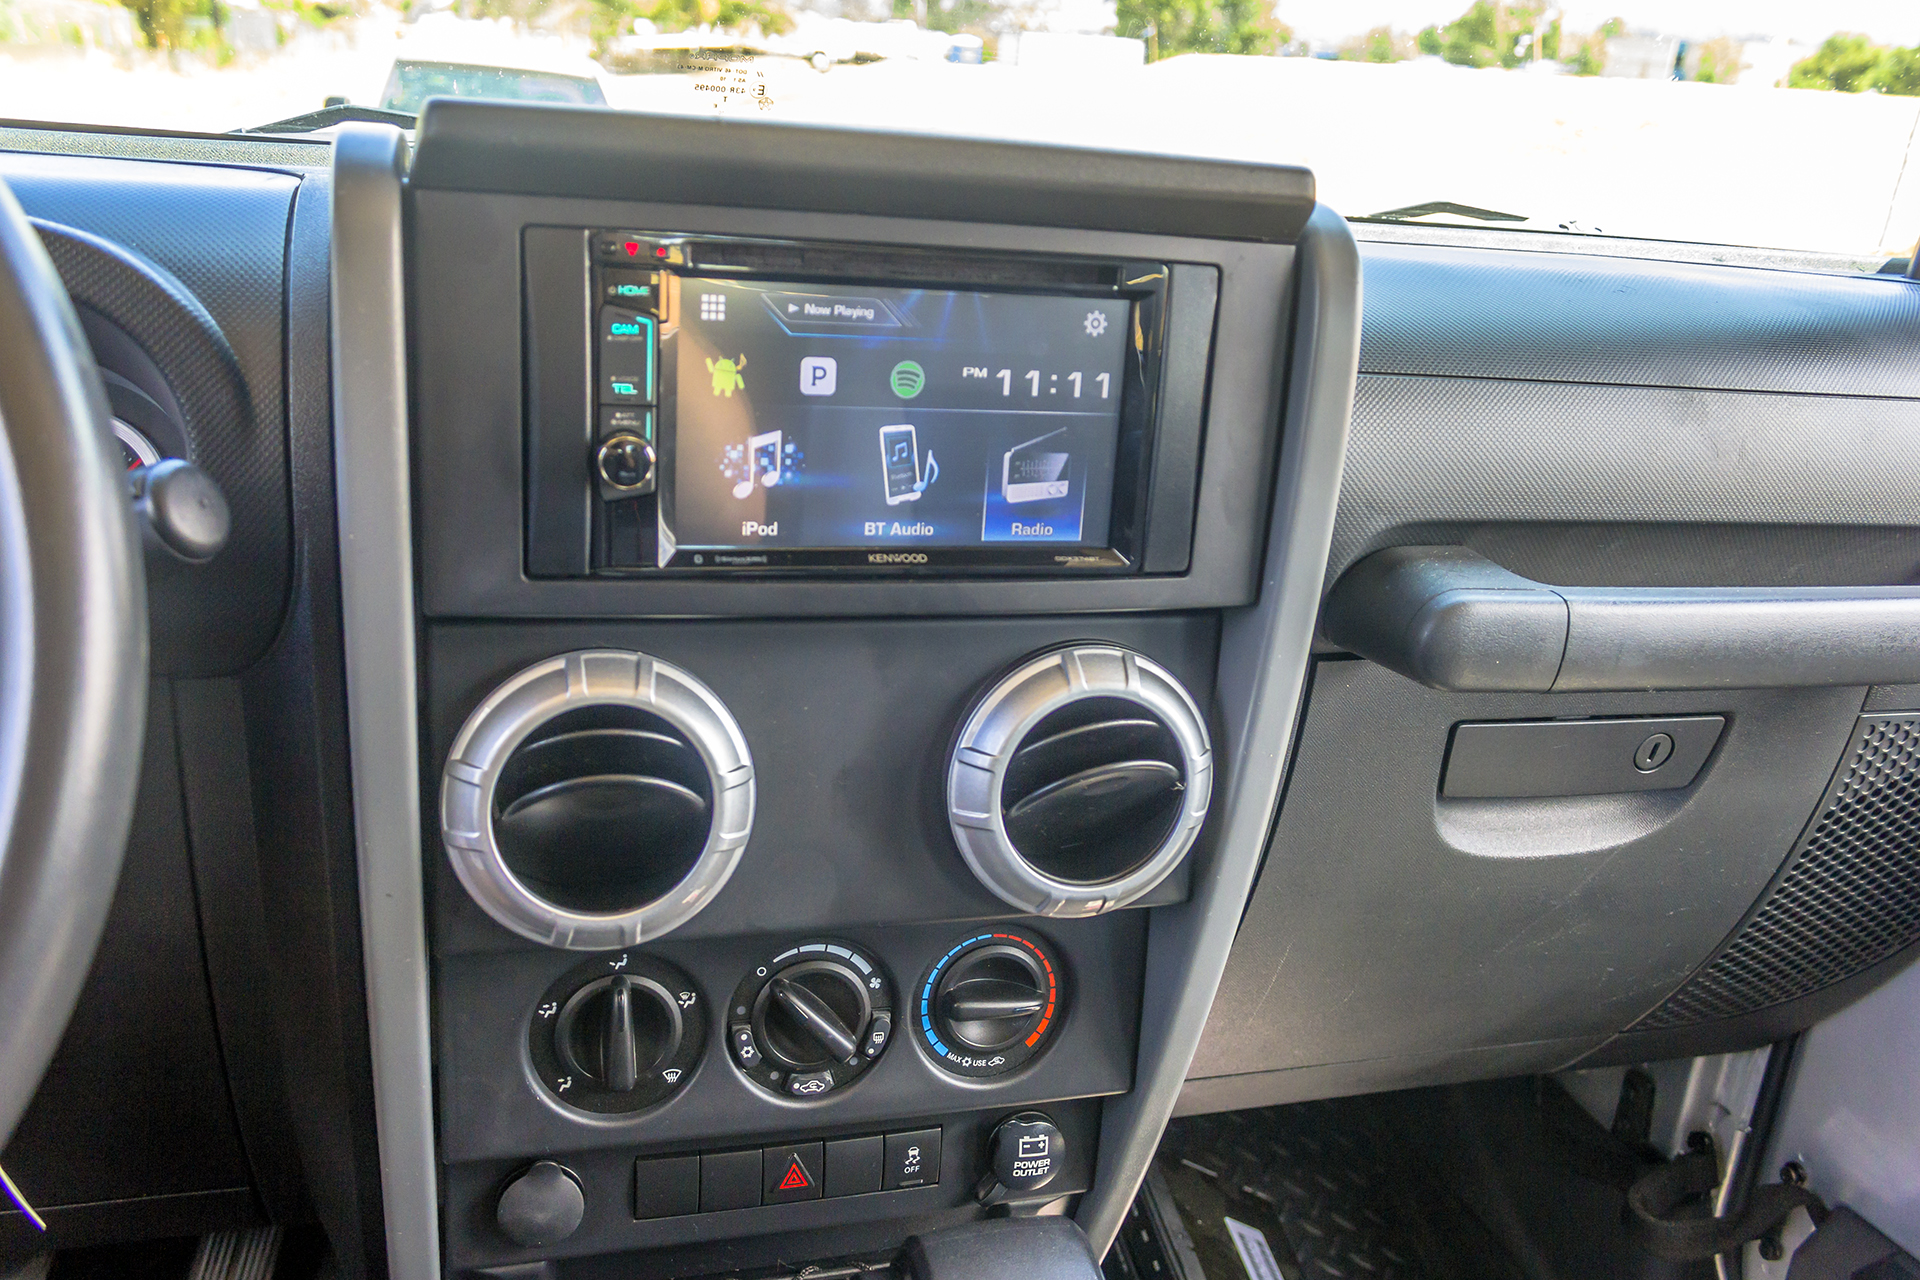 2010+Jeep+Wrangler+DDIN?format=1500w 2010 jeep wrangler ddin install twelve volt technologies 2010 jeep wrangler radio wiring harness at mifinder.co